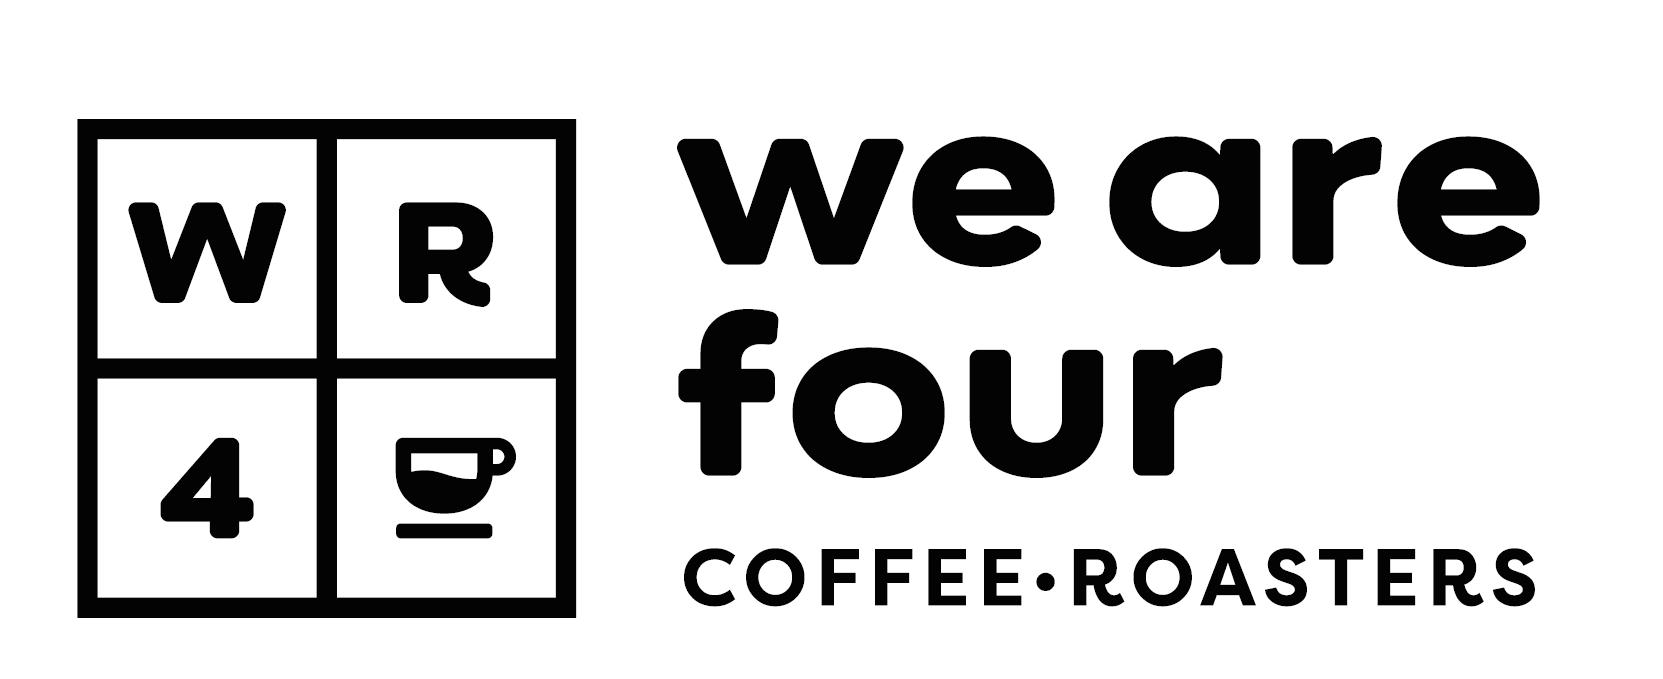 Empresas Desafio10x: We Are Four Coffee Roasters